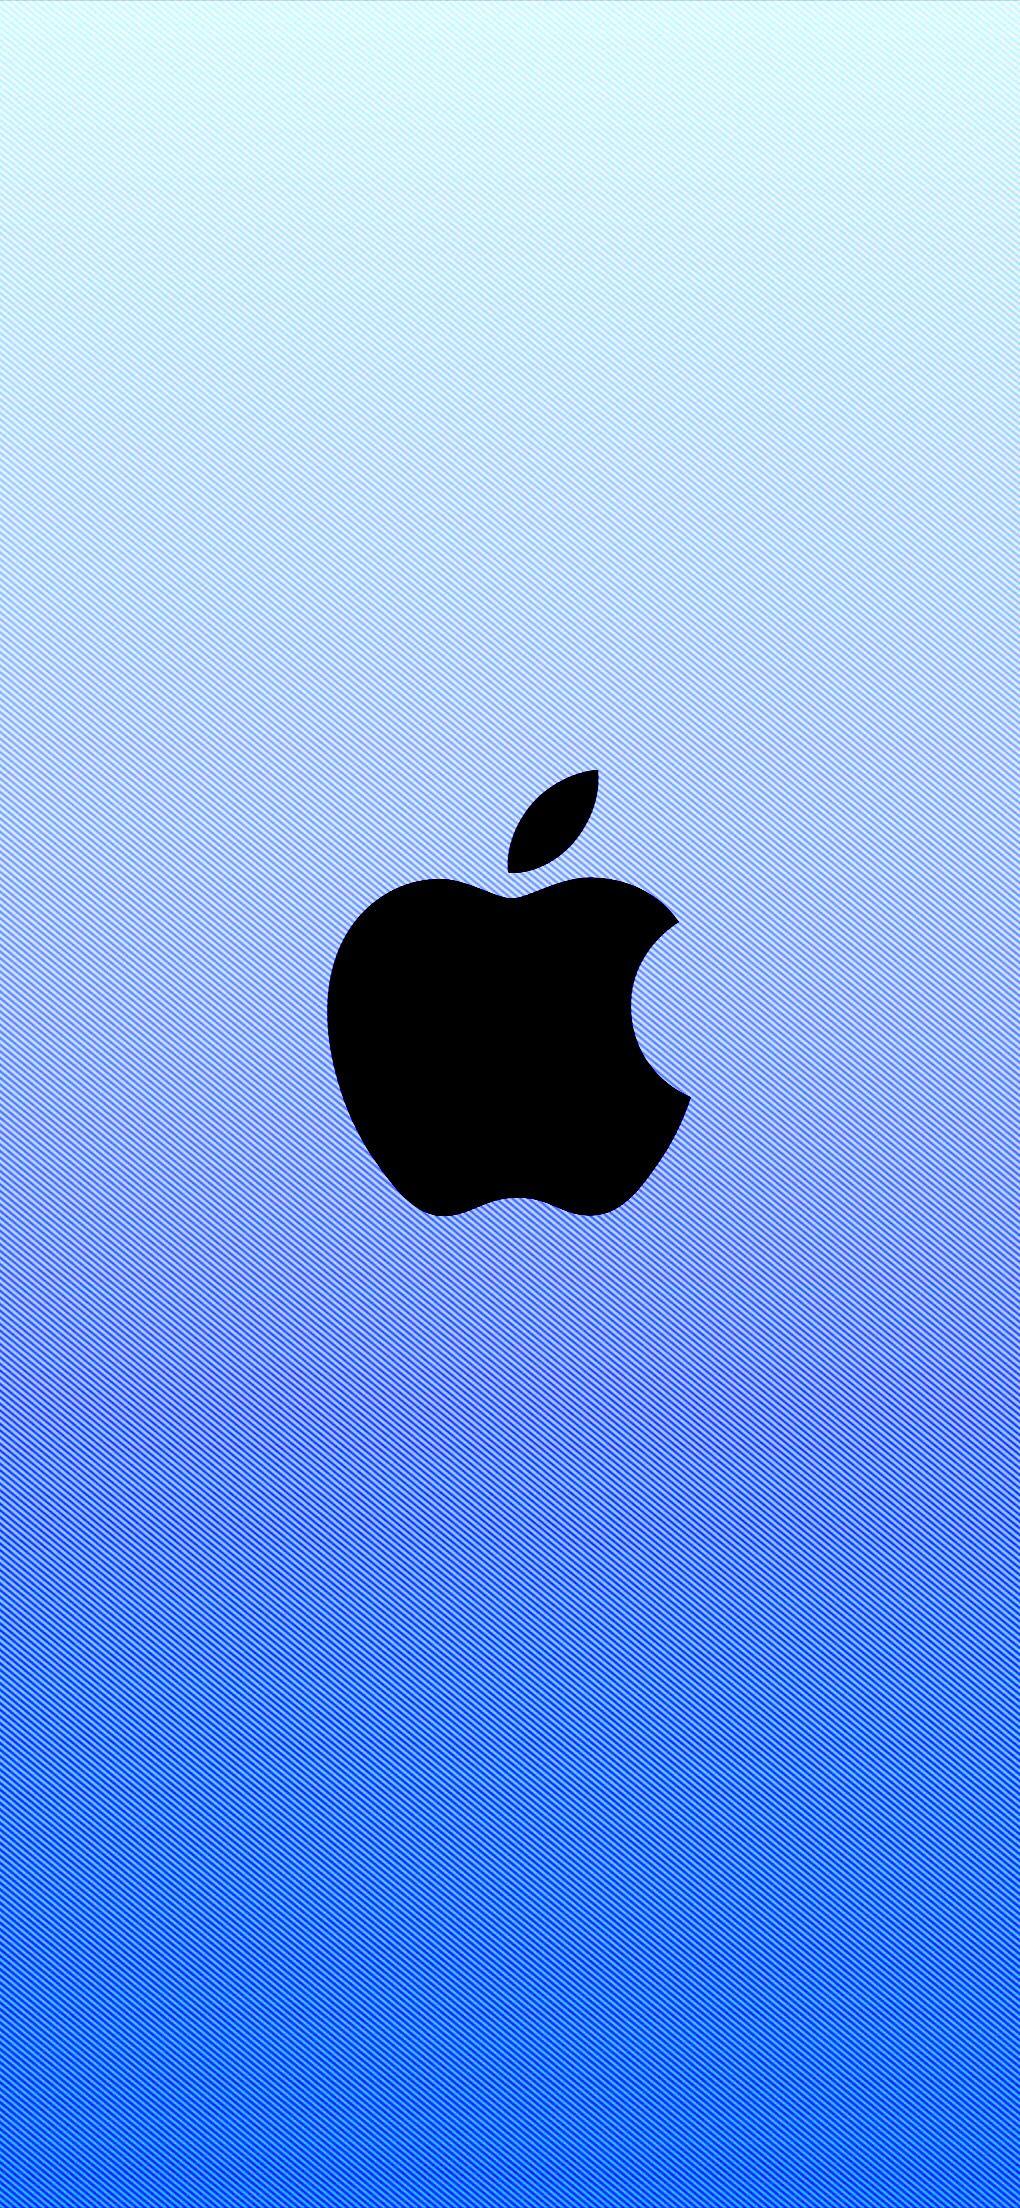 Ios13 Iphonewallpaper Apple Logo Colorful Lockscreen Apple Iphone Wallpaper Hd Apple Wallpaper Iphone Ipad Mini Wallpaper